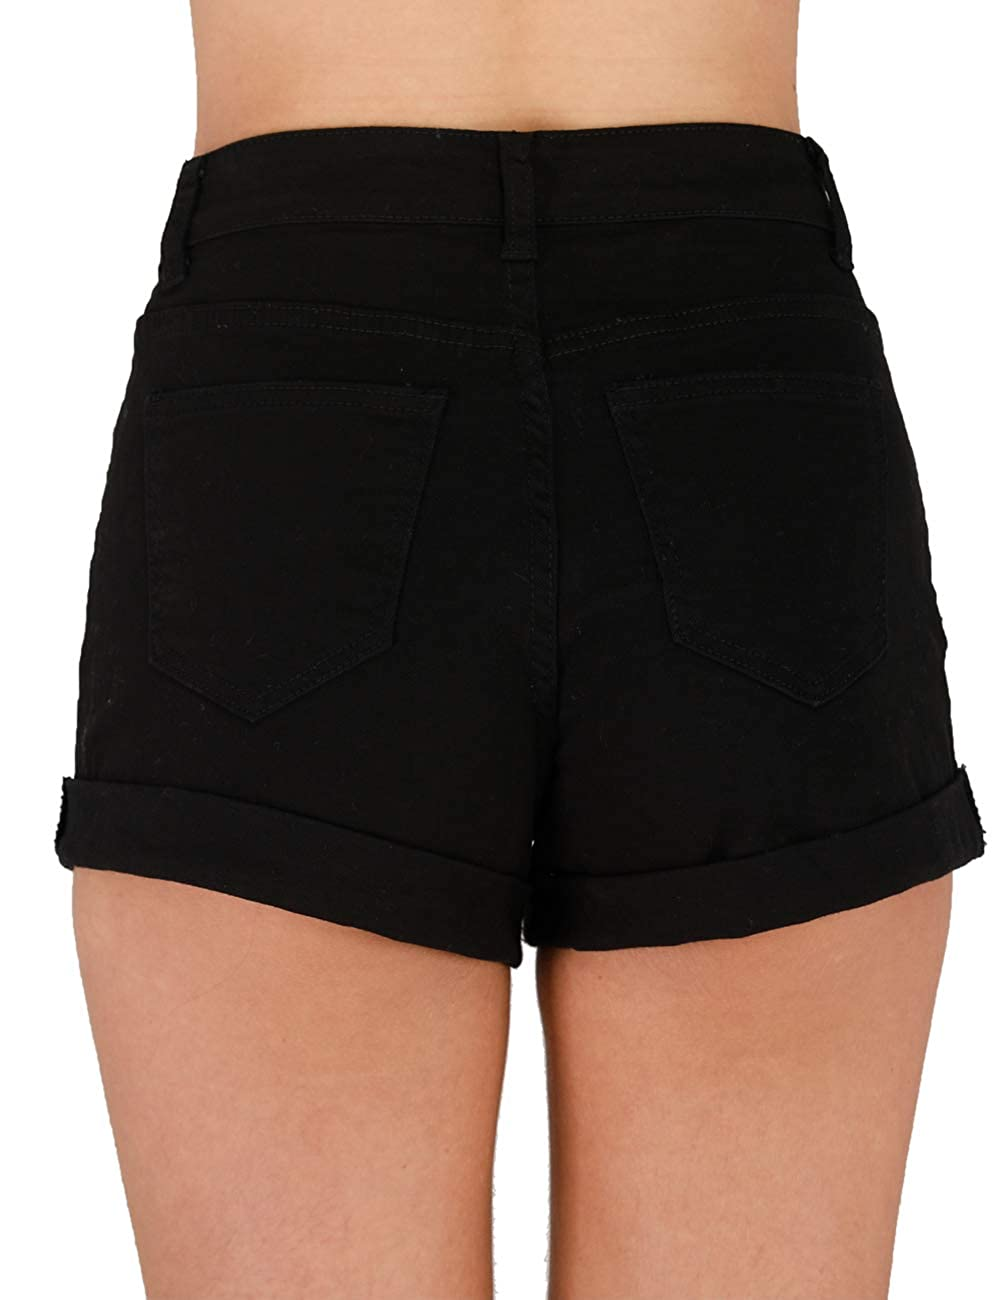 87ba23ab4b7 Haola Women's Juniors Vintage Denim High Waisted Folded Hem Jeans Shorts at  Amazon Women's Clothing store: